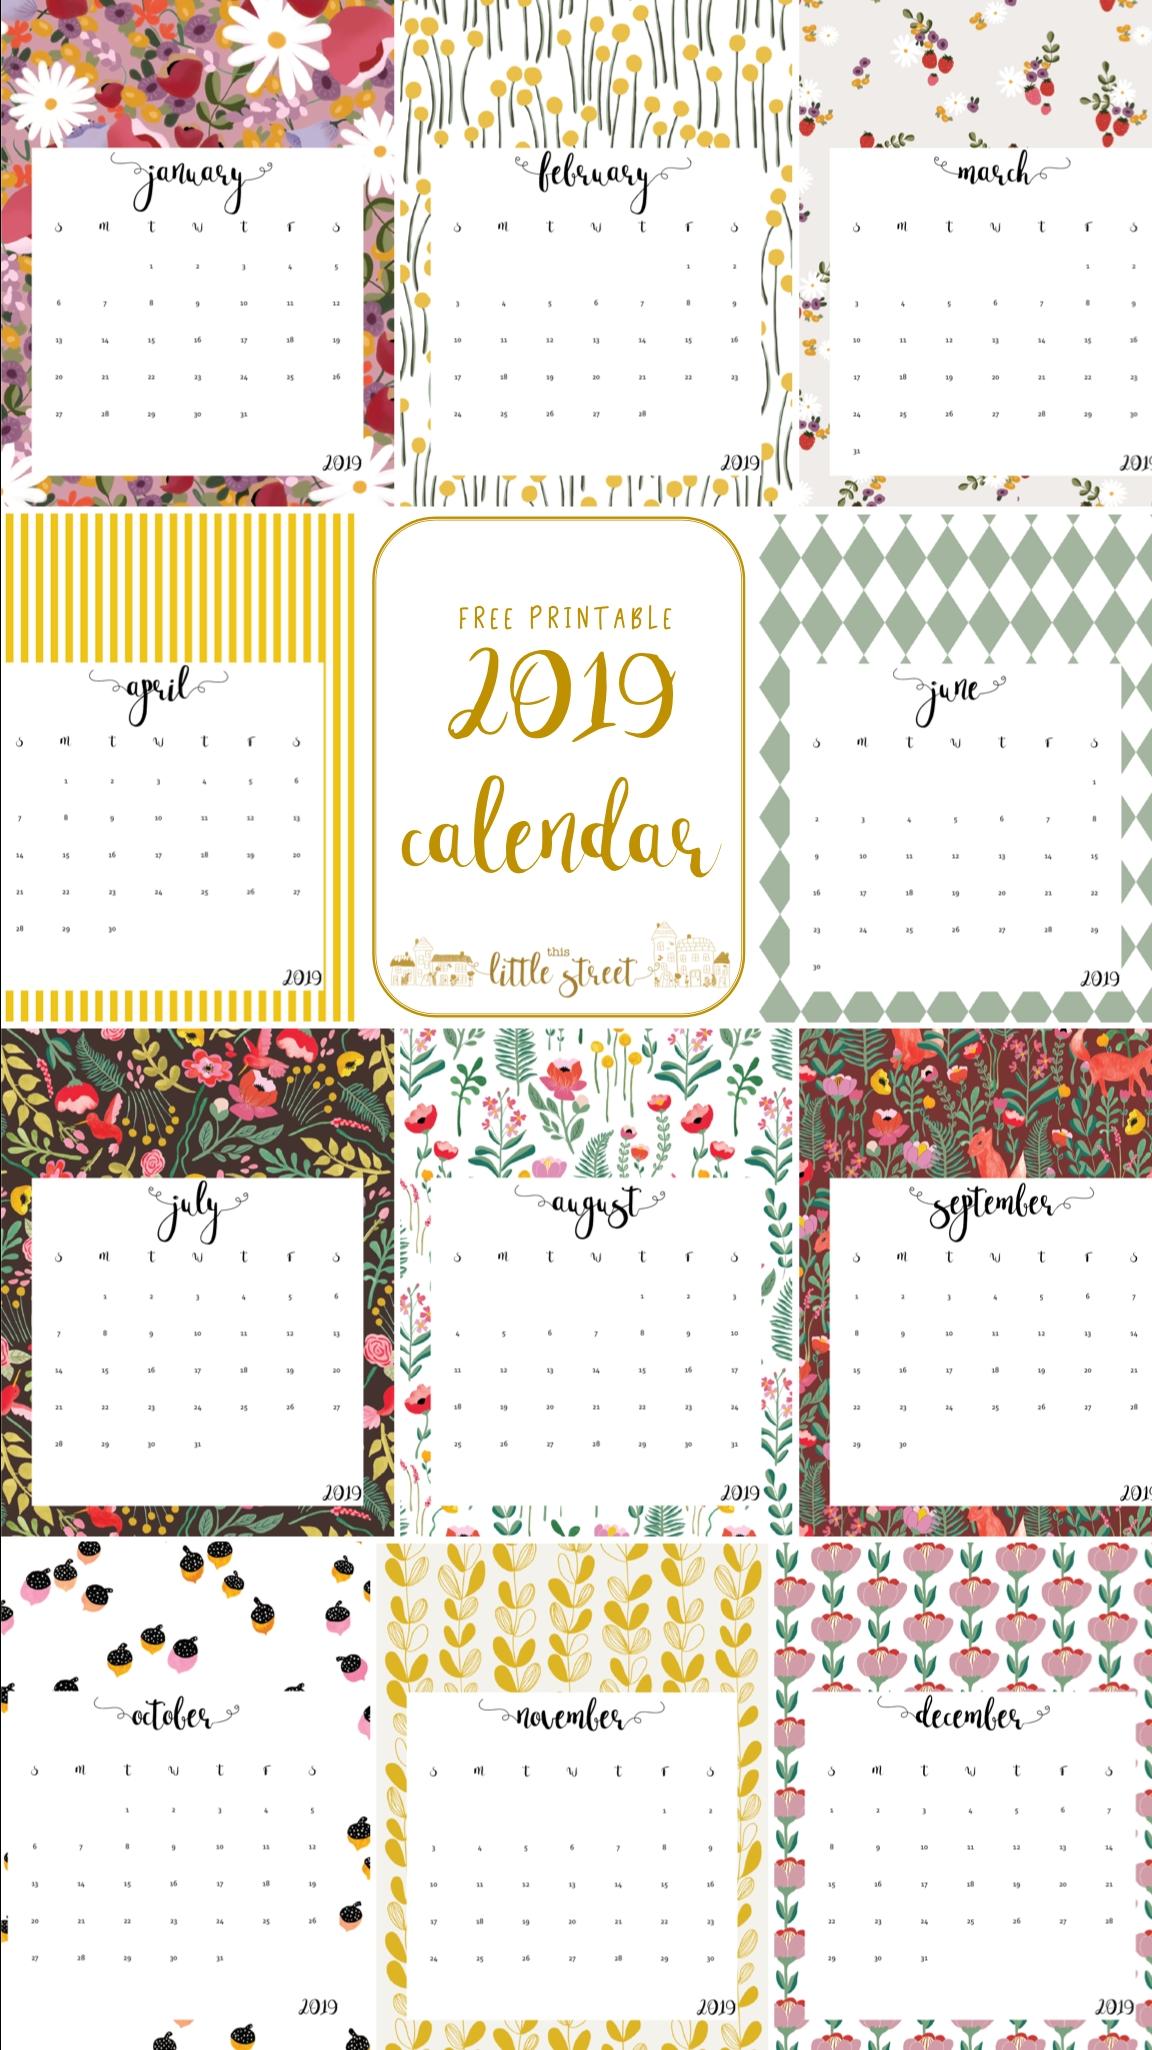 2019 Calendar - Free Printable! | This Little Street : This